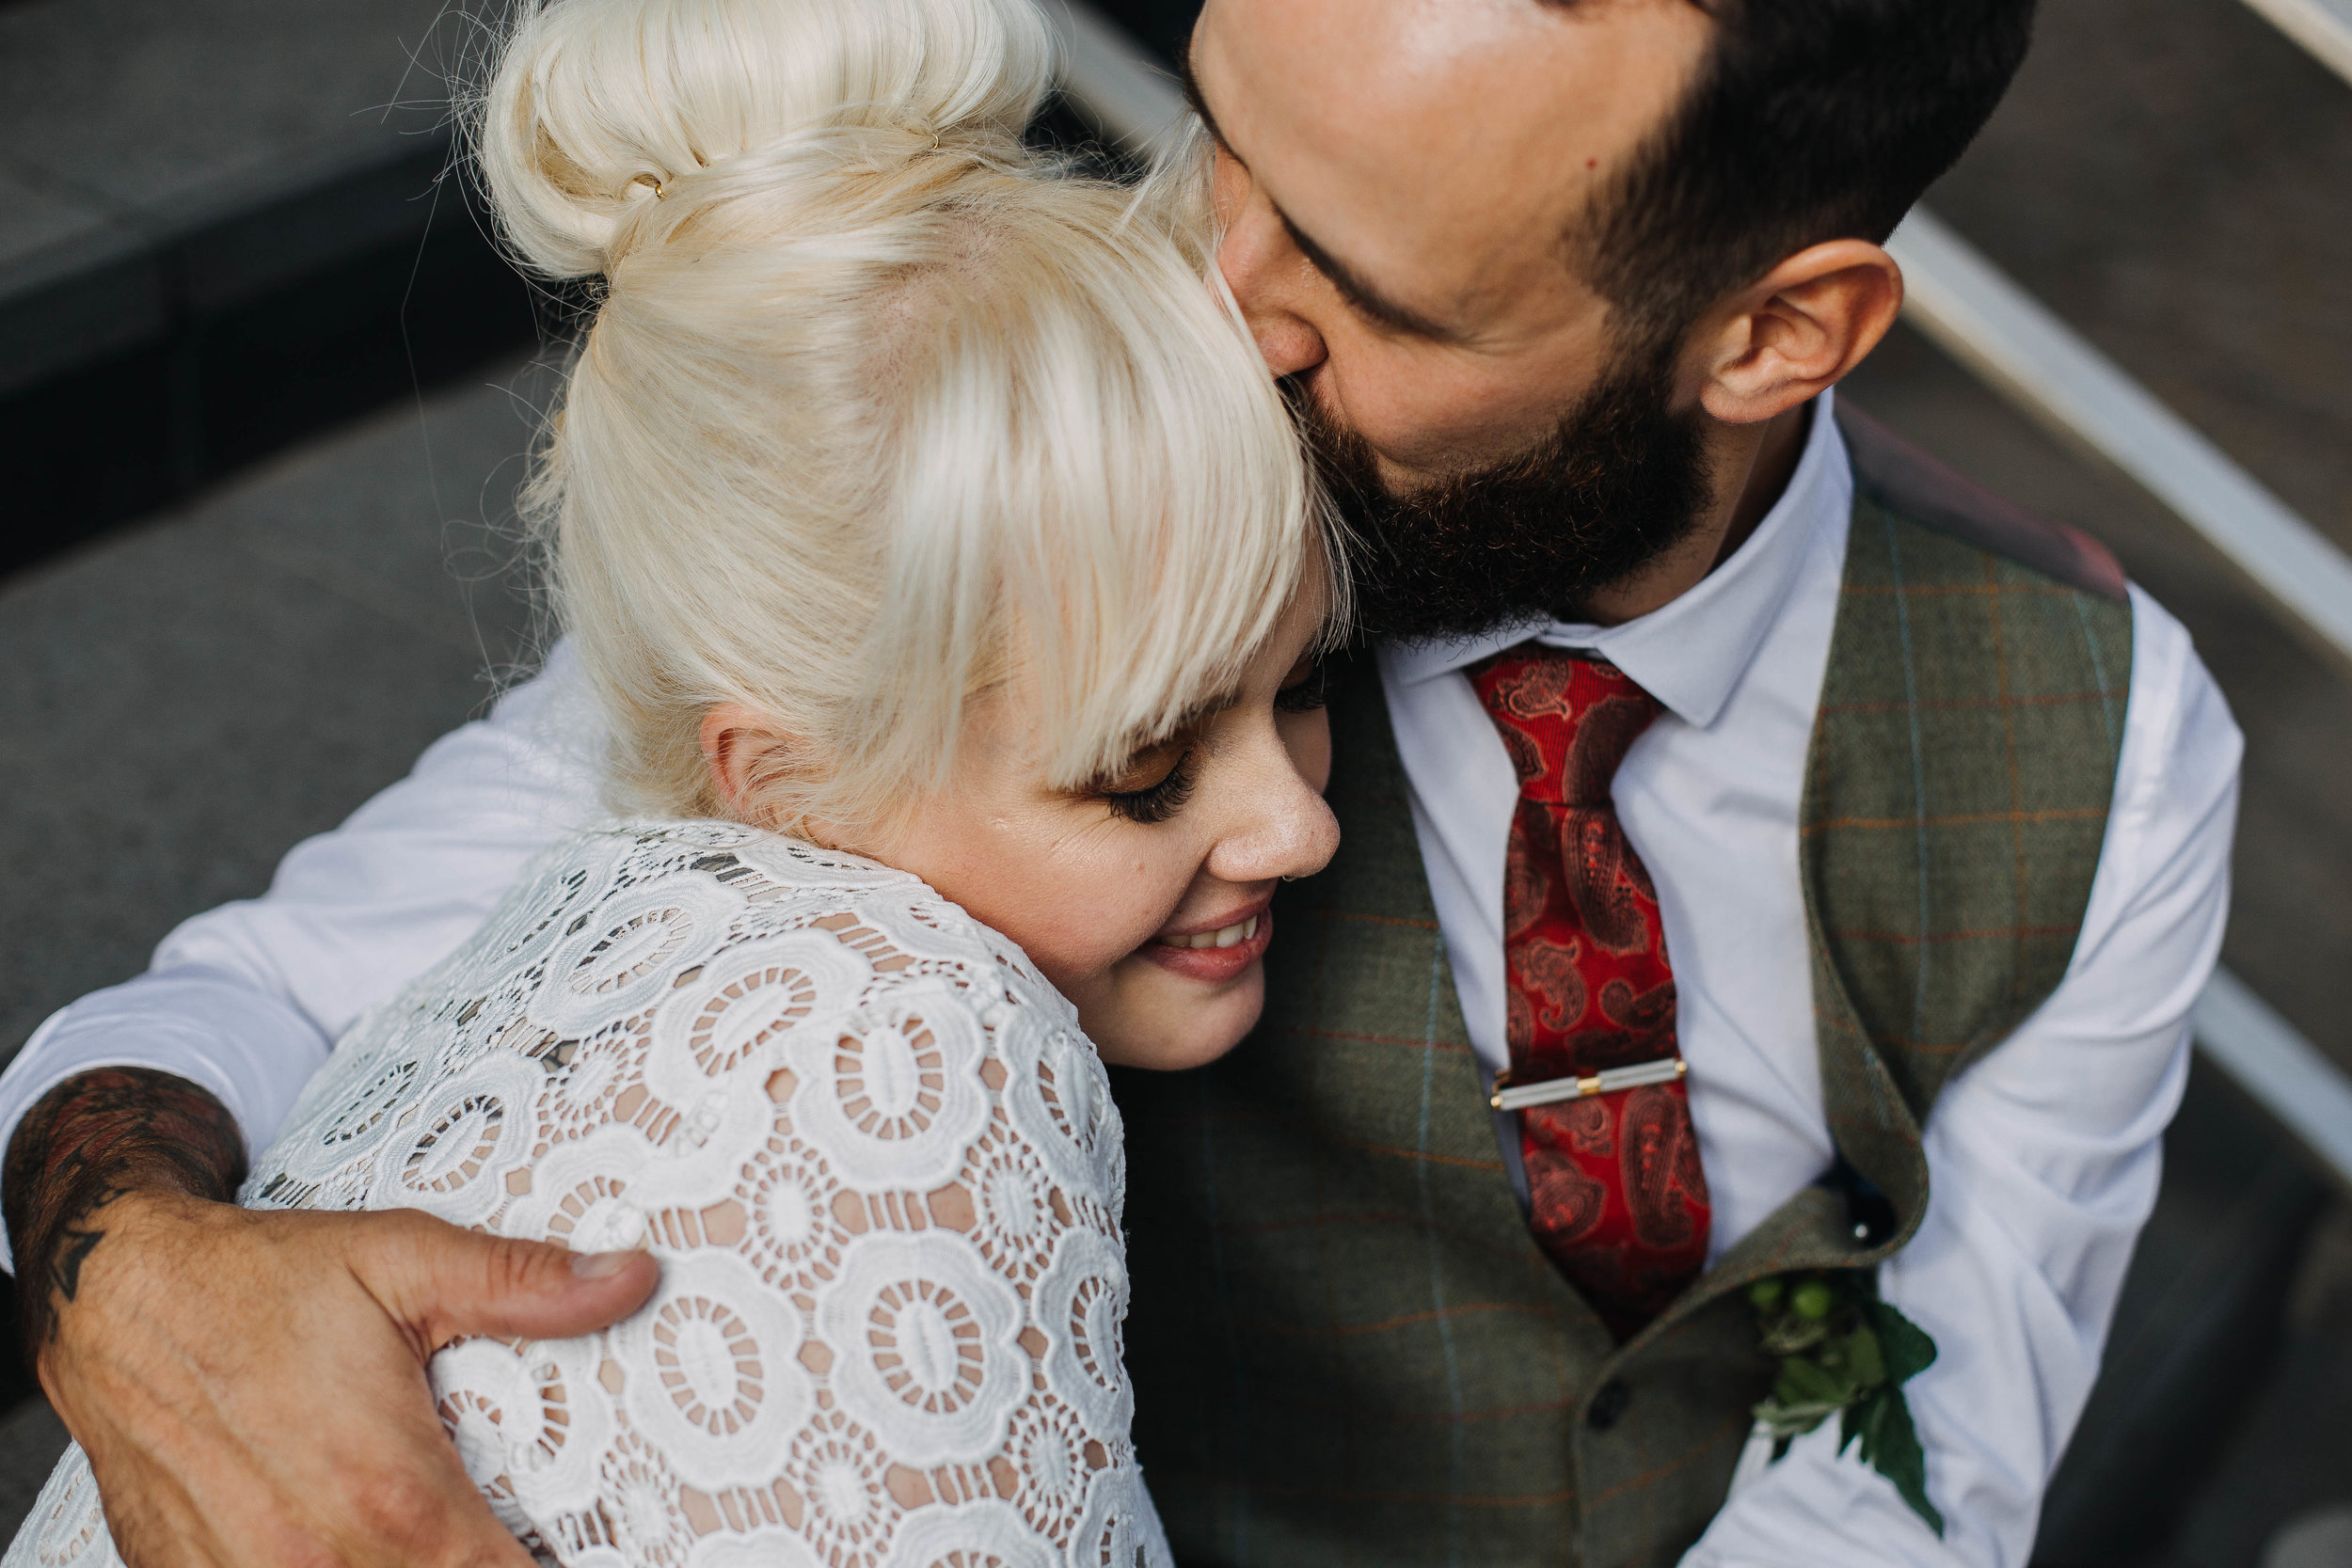 Sheffield Yorkshire Documentary Wedding Photographer The hide